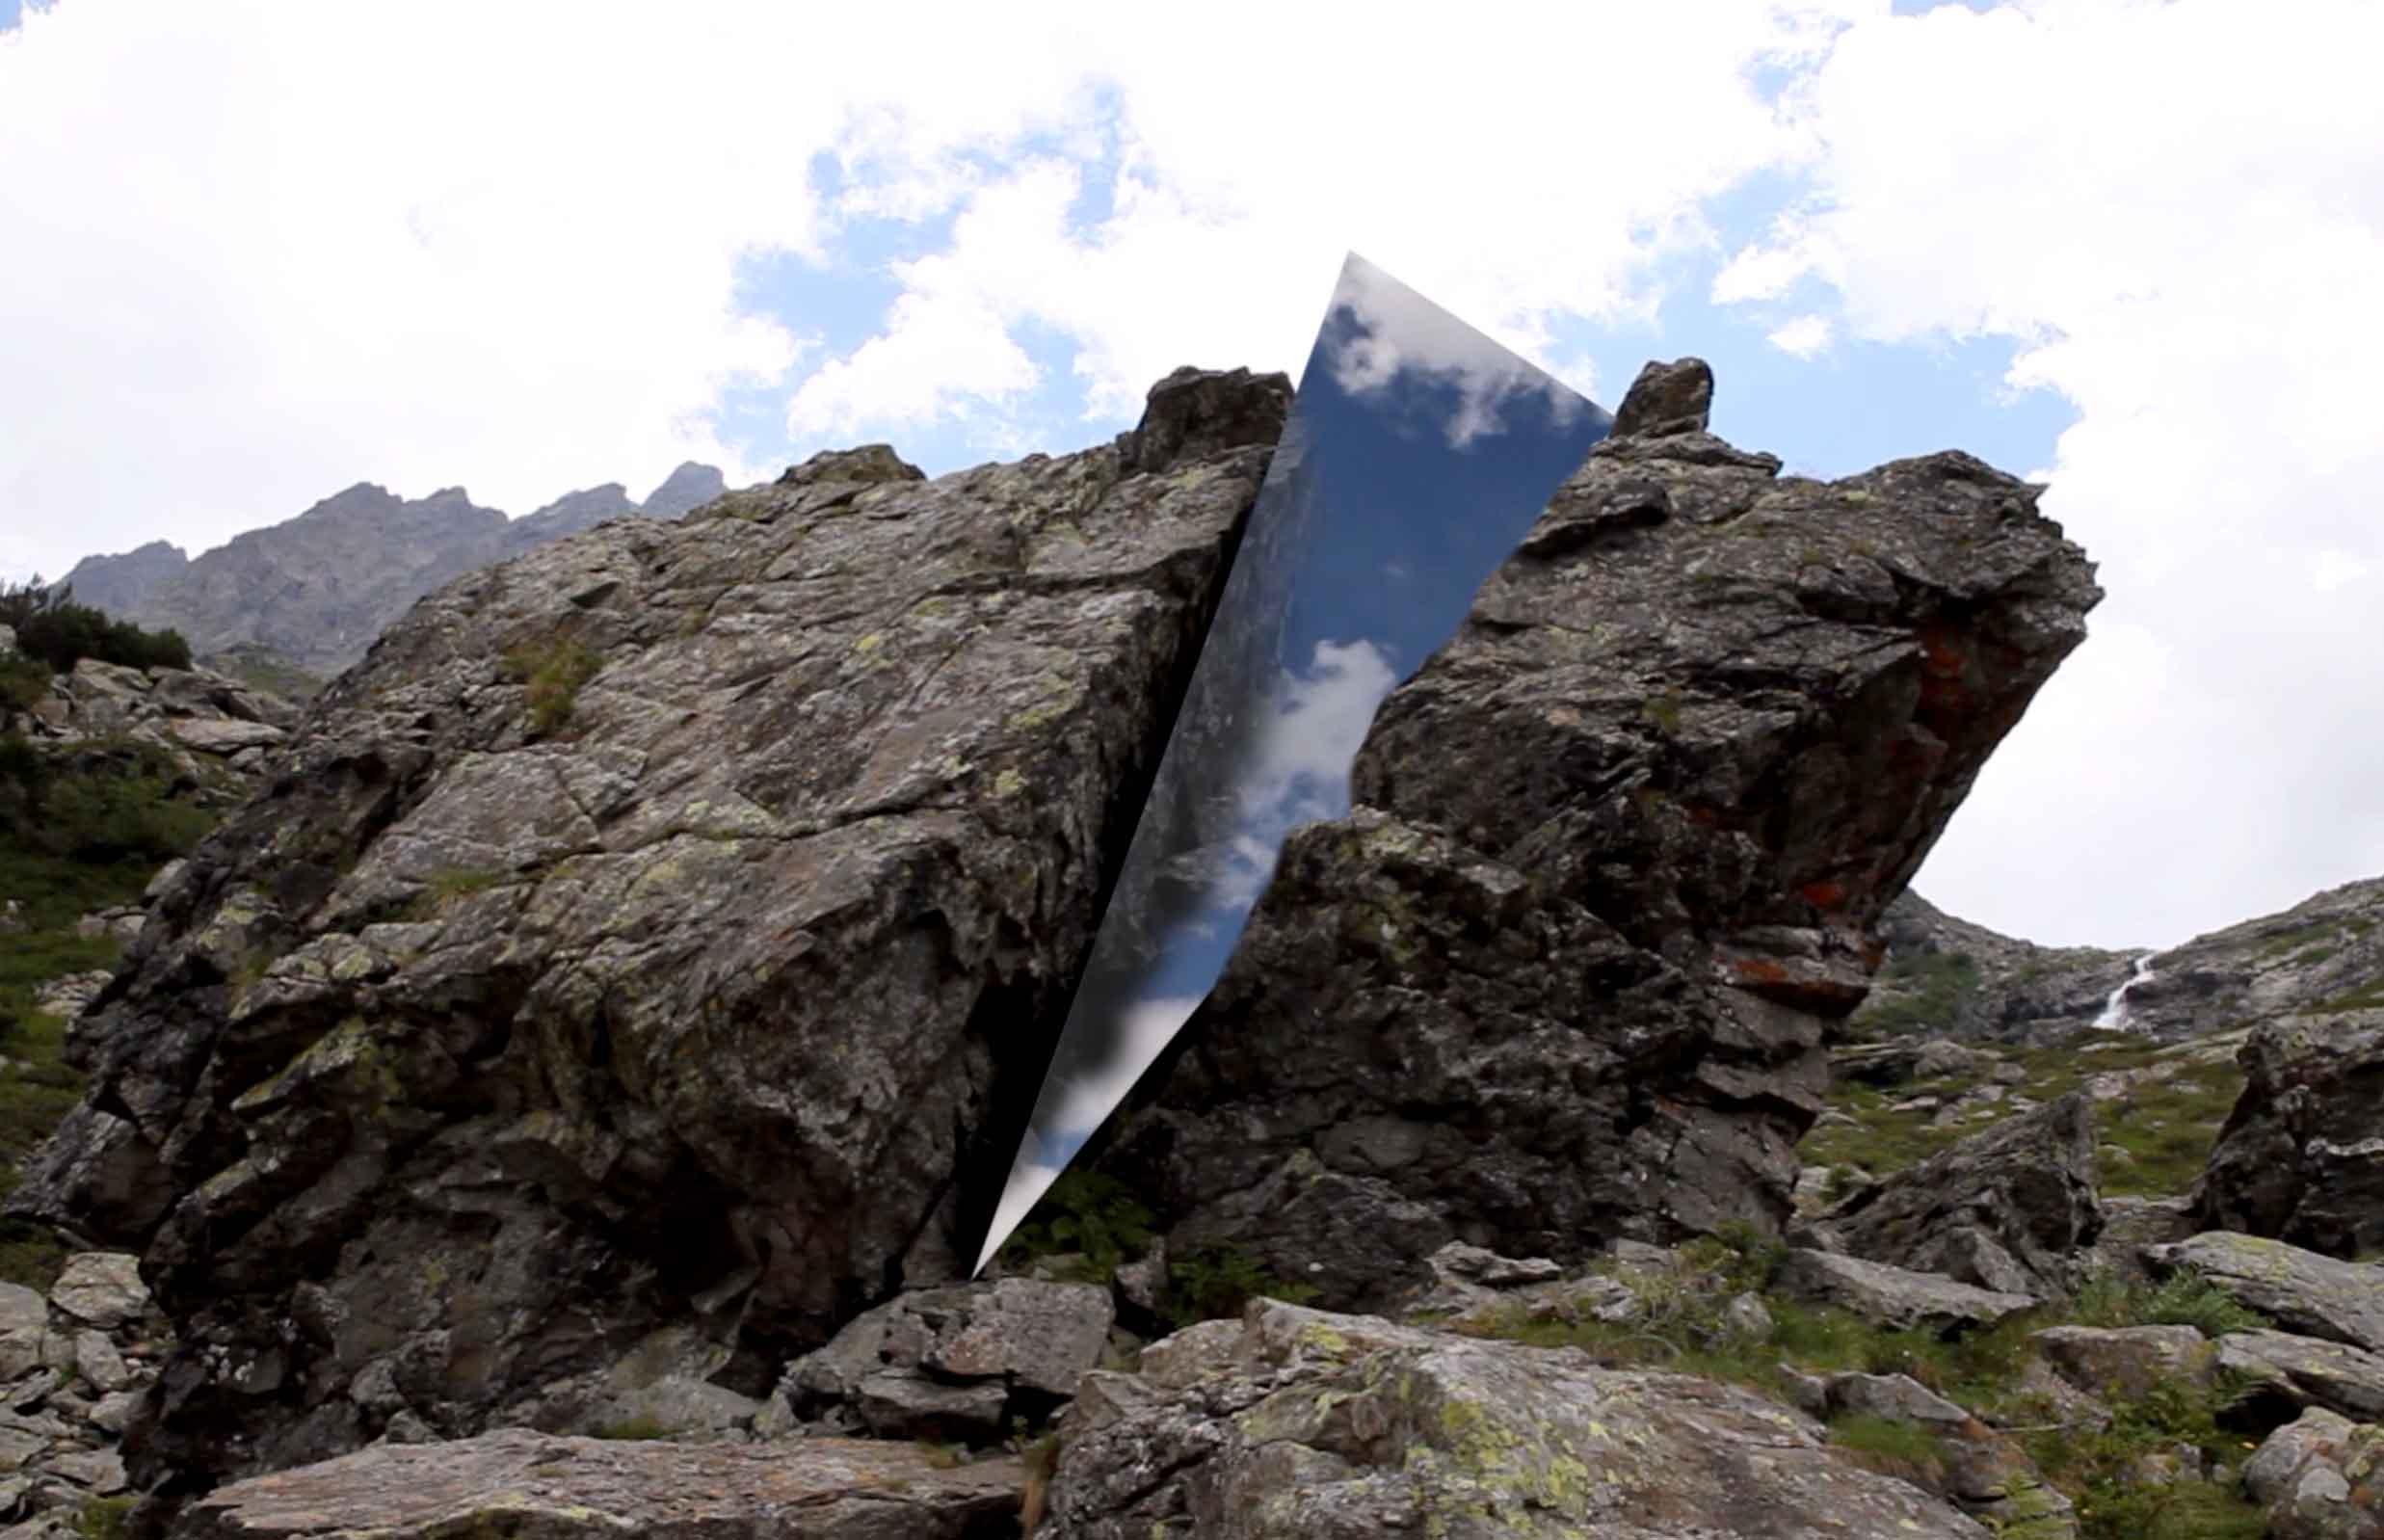 Alberto Rocchetti Scratch stone render 2017